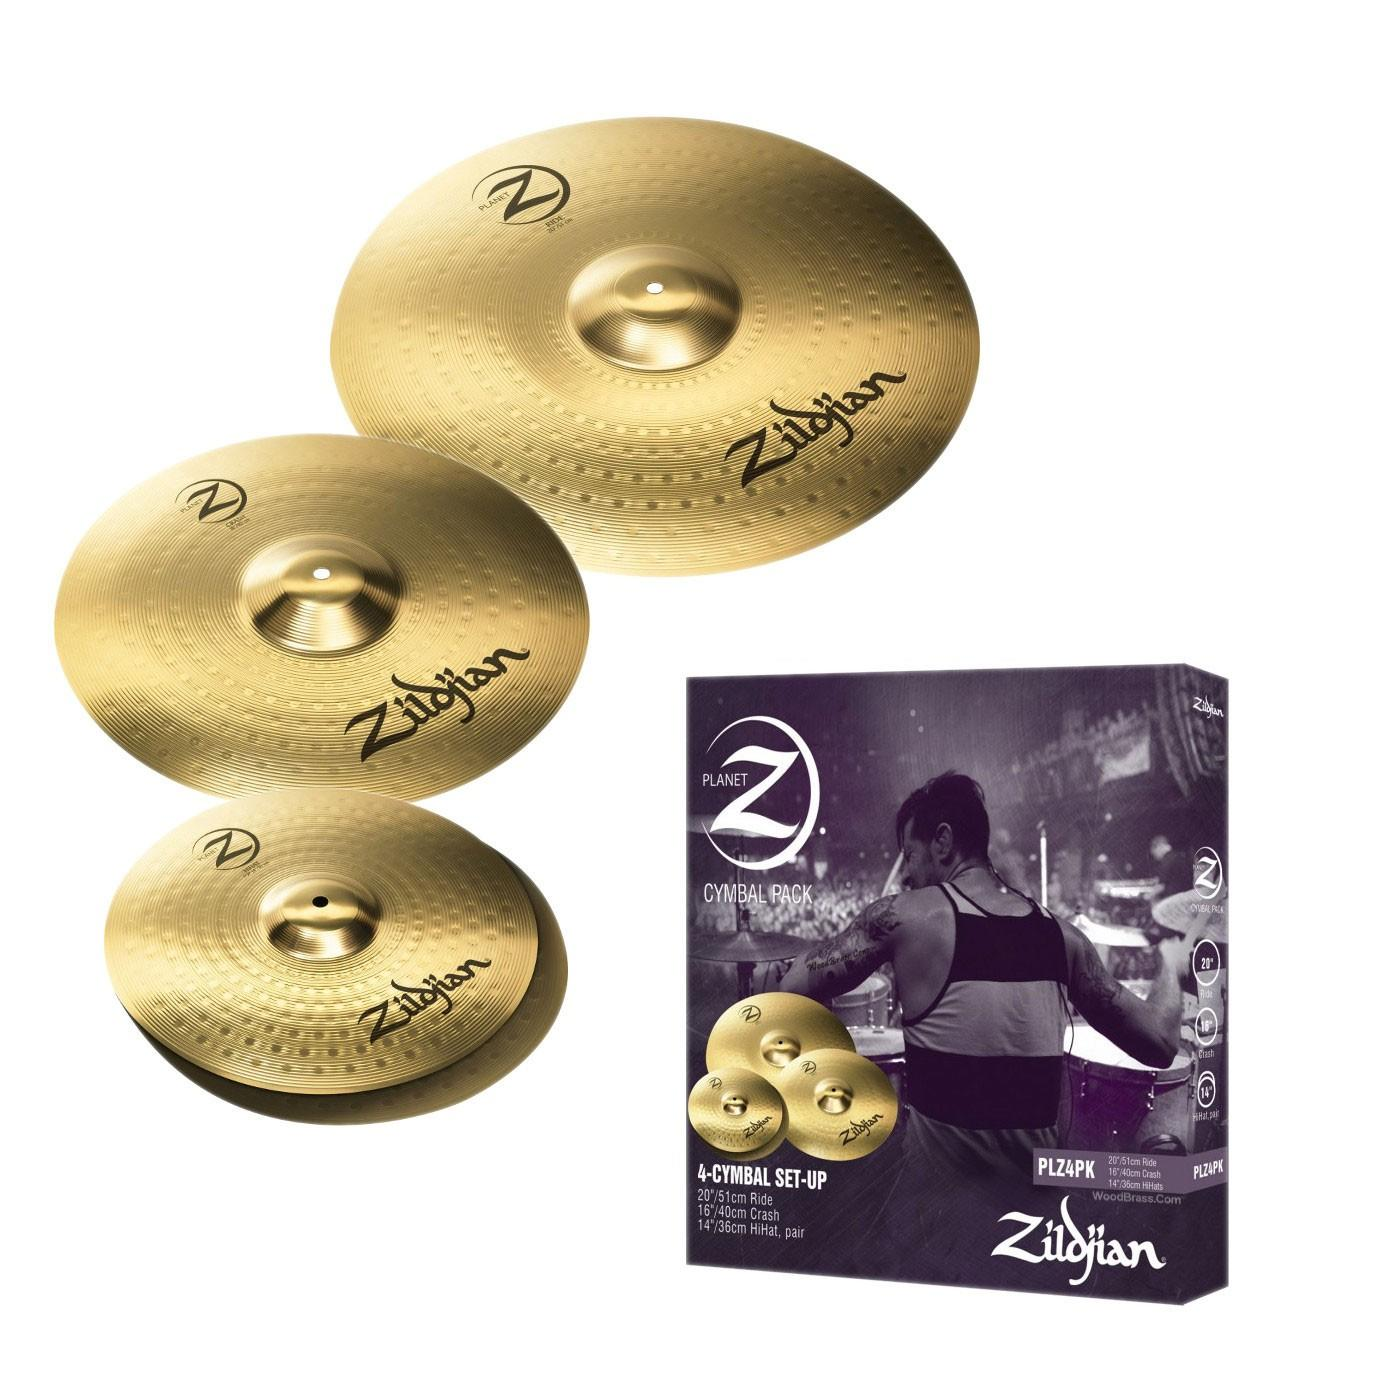 Pack de Platillos Zildjian Planet Z PLZ4PK